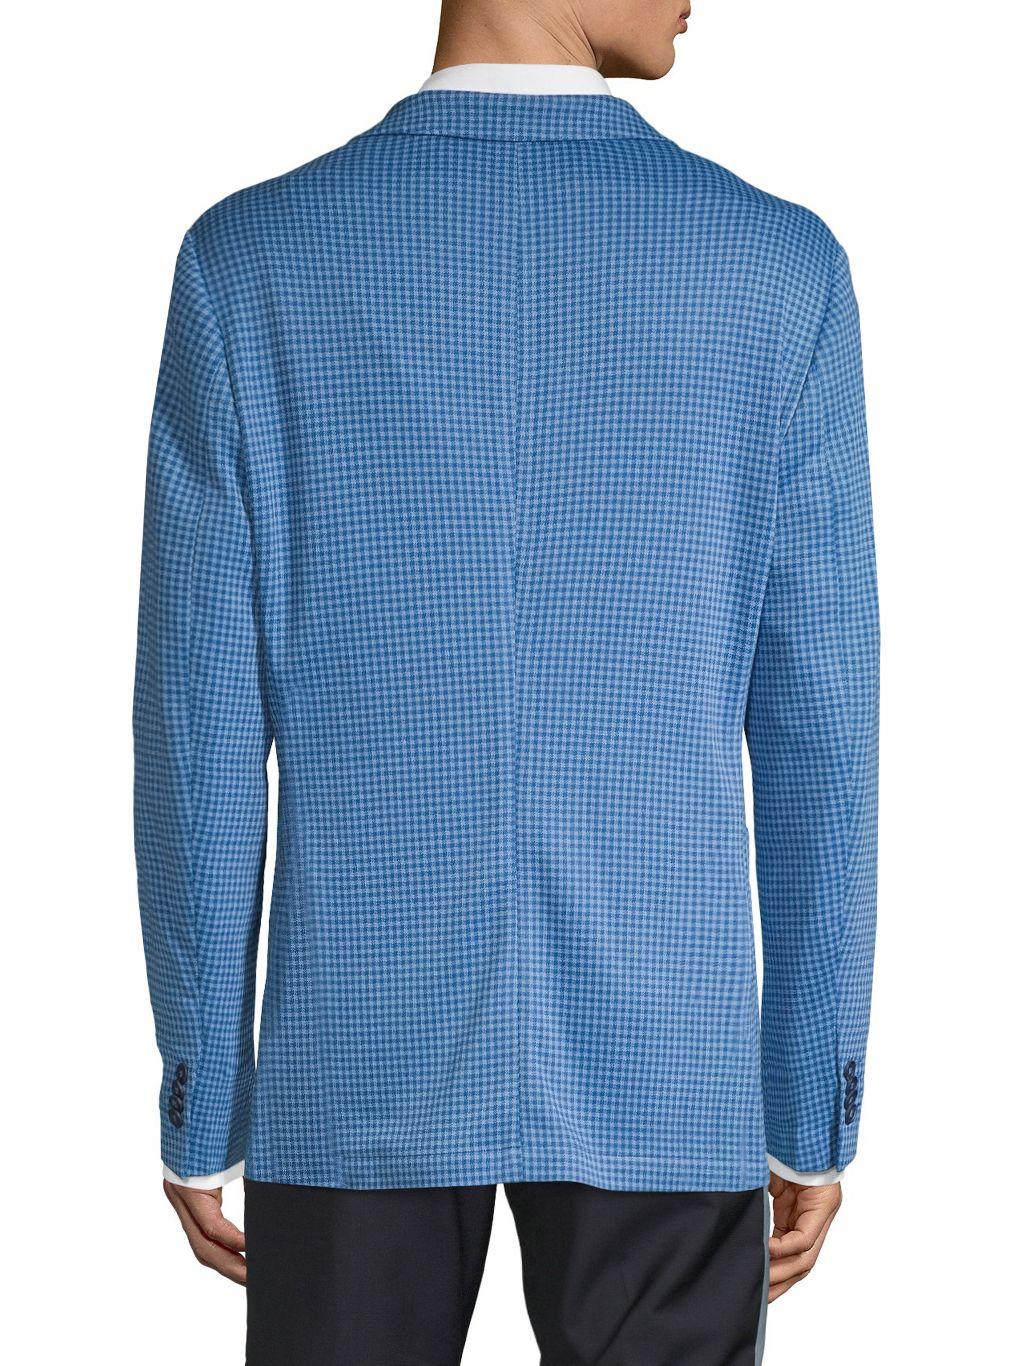 TailorByrd Standard-Fit Mini Check Knit Sportcoat